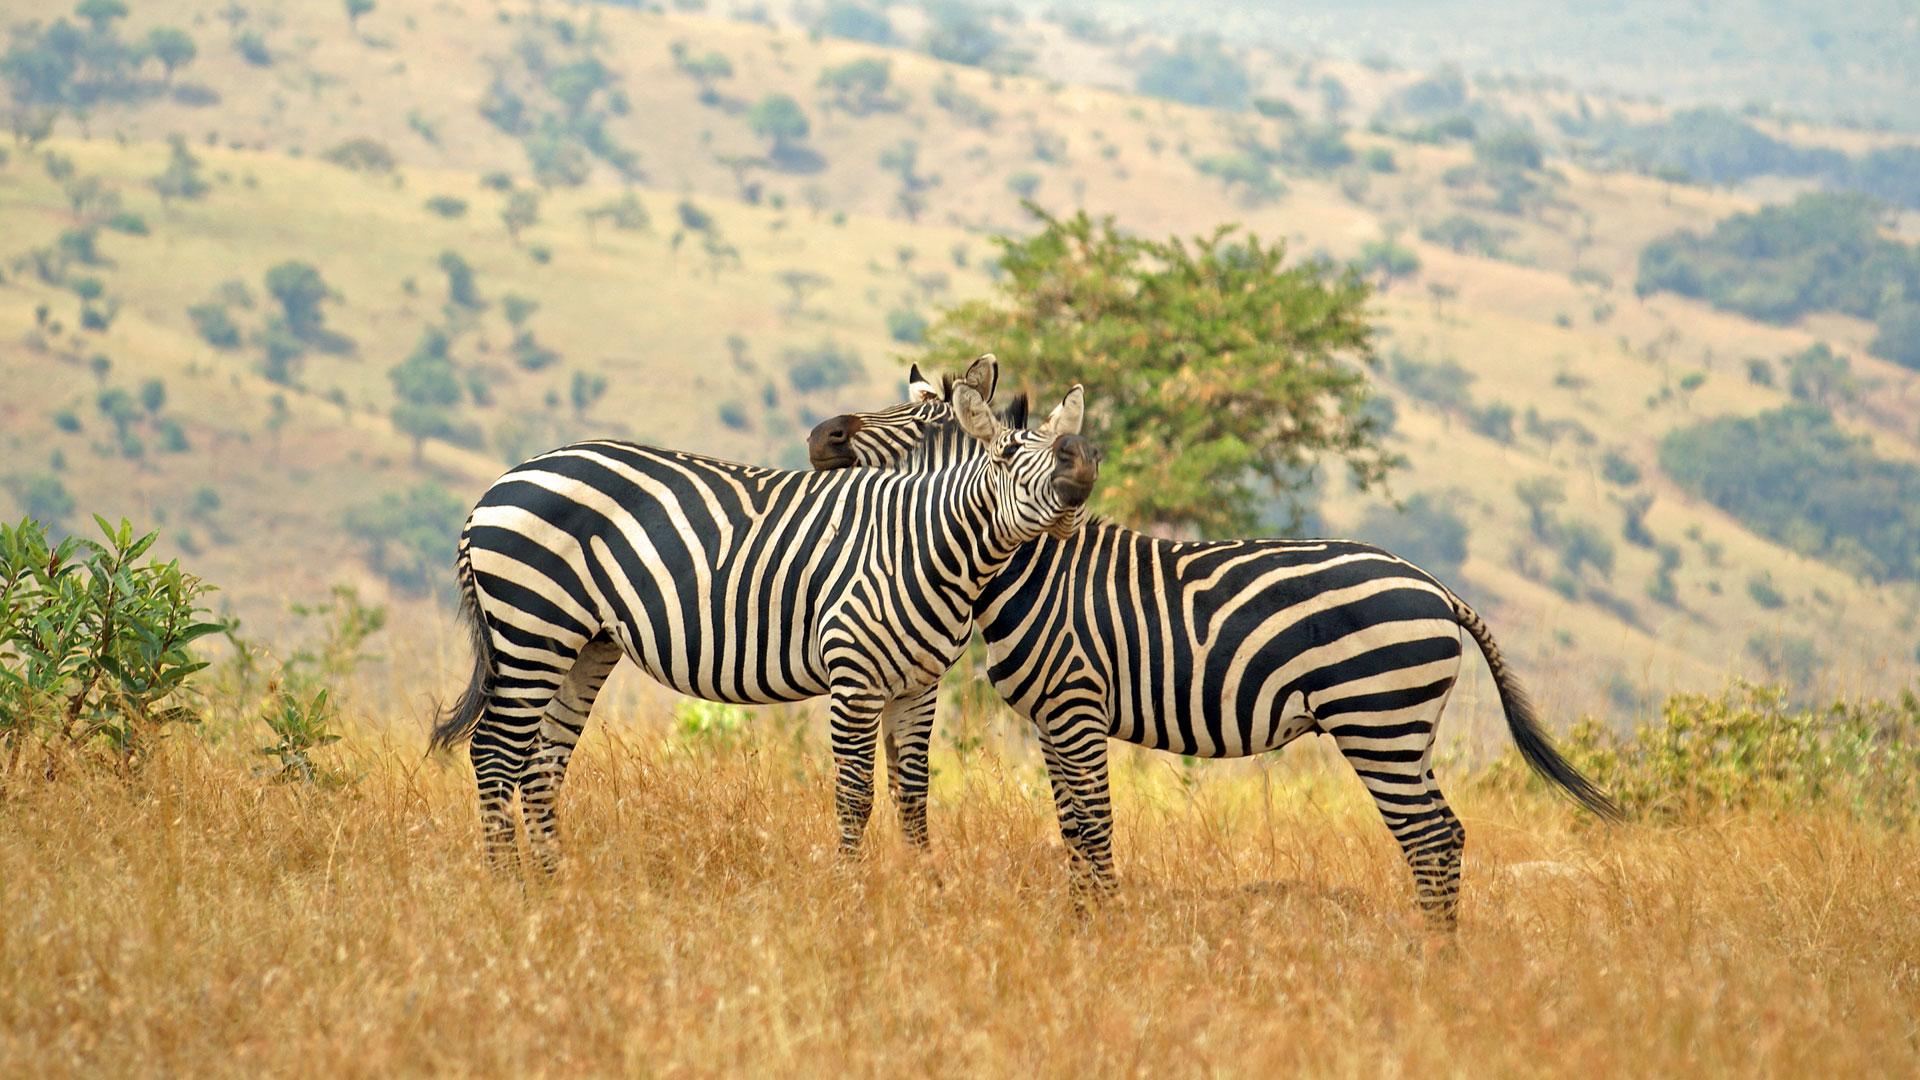 nws-st-rwanda-zebra